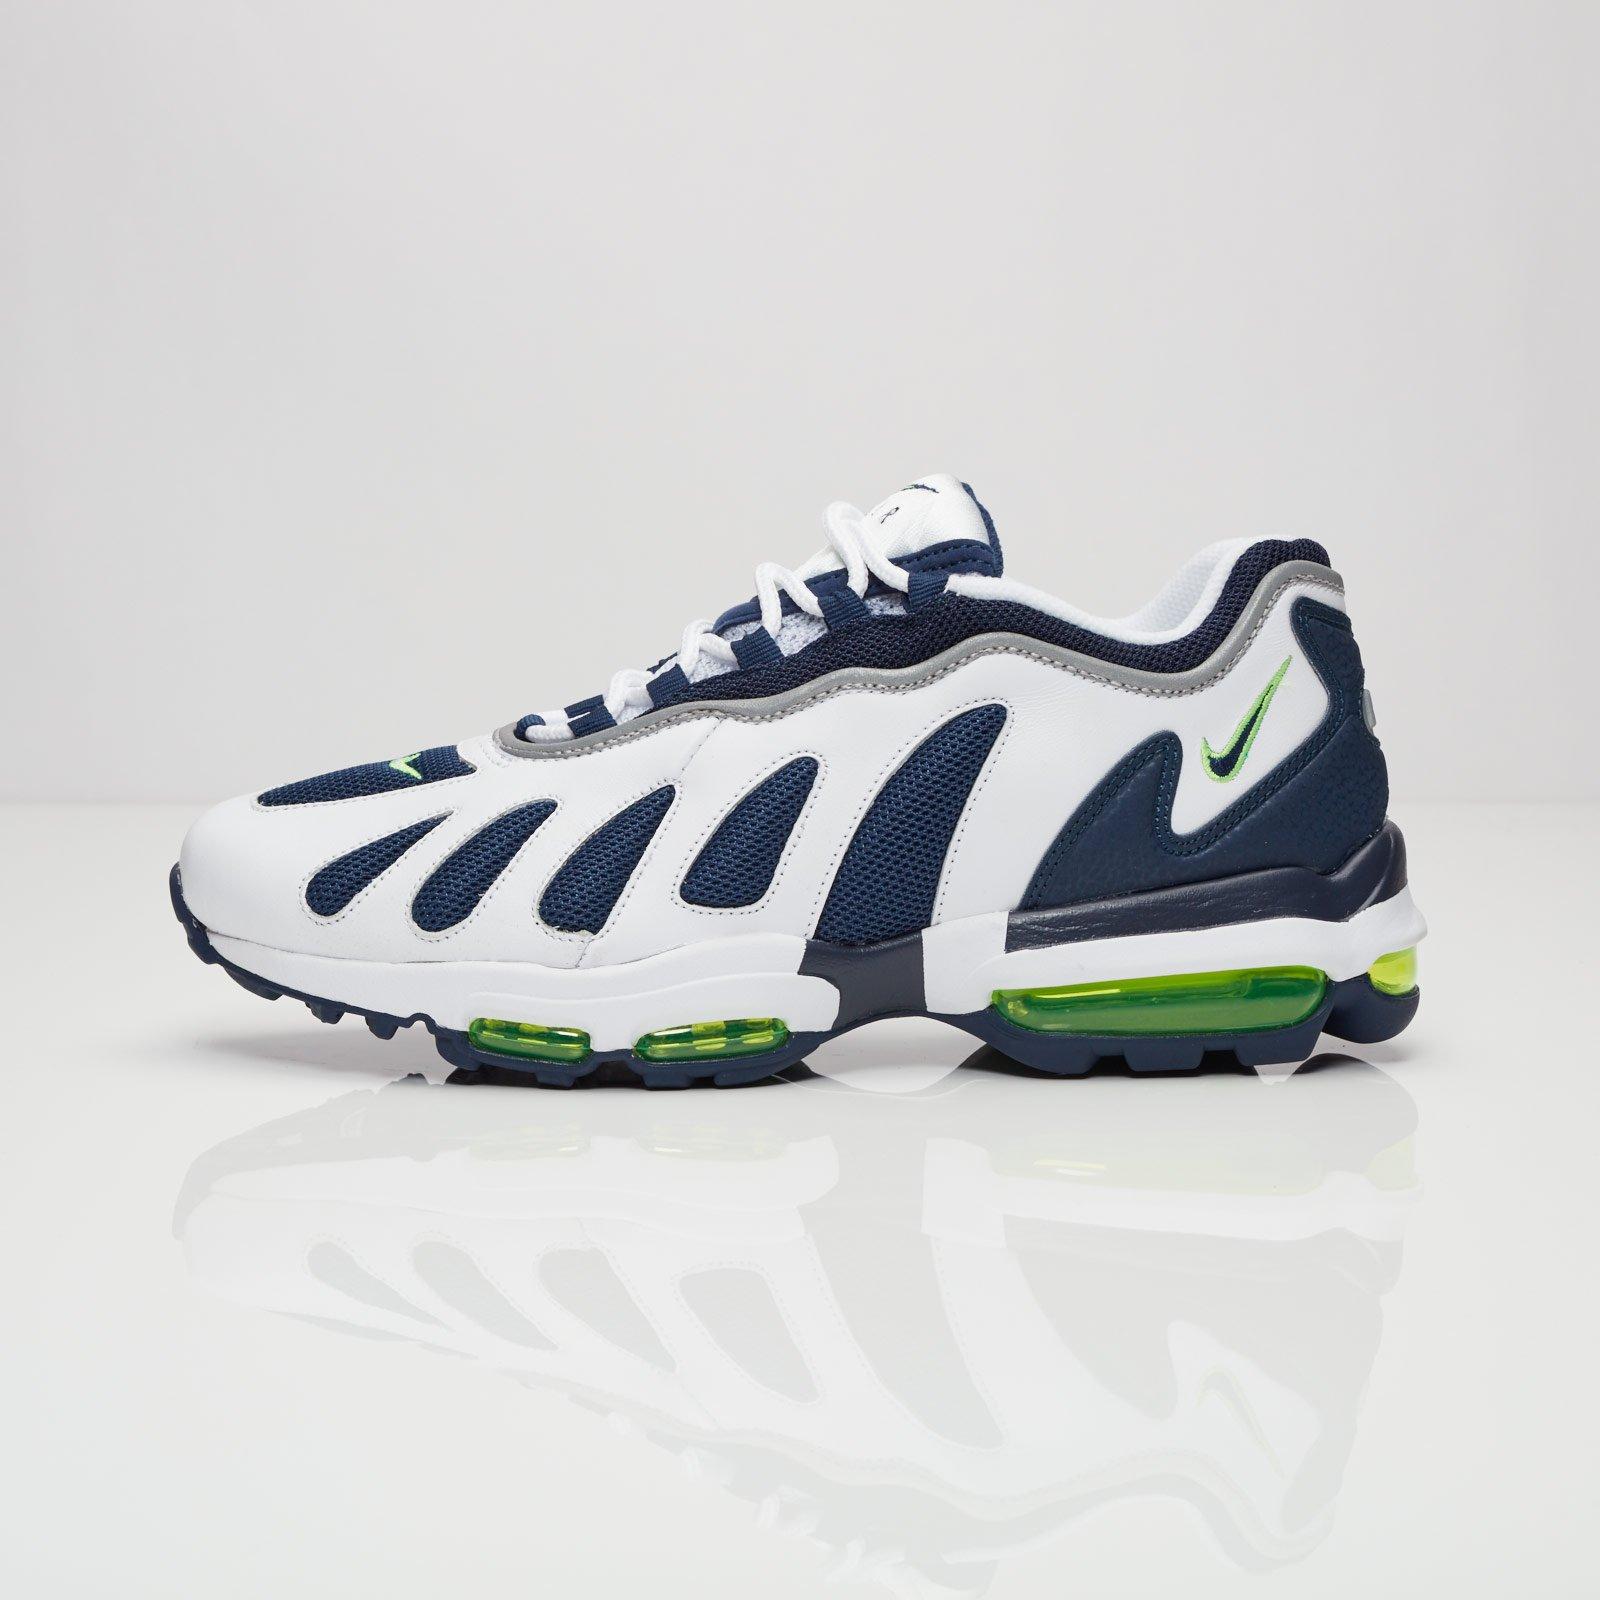 timeless design 1d98c aa37c Nike Air Max 96 XX - 870165-100 - Sneakersnstuff   sneakers   streetwear  online since 1999